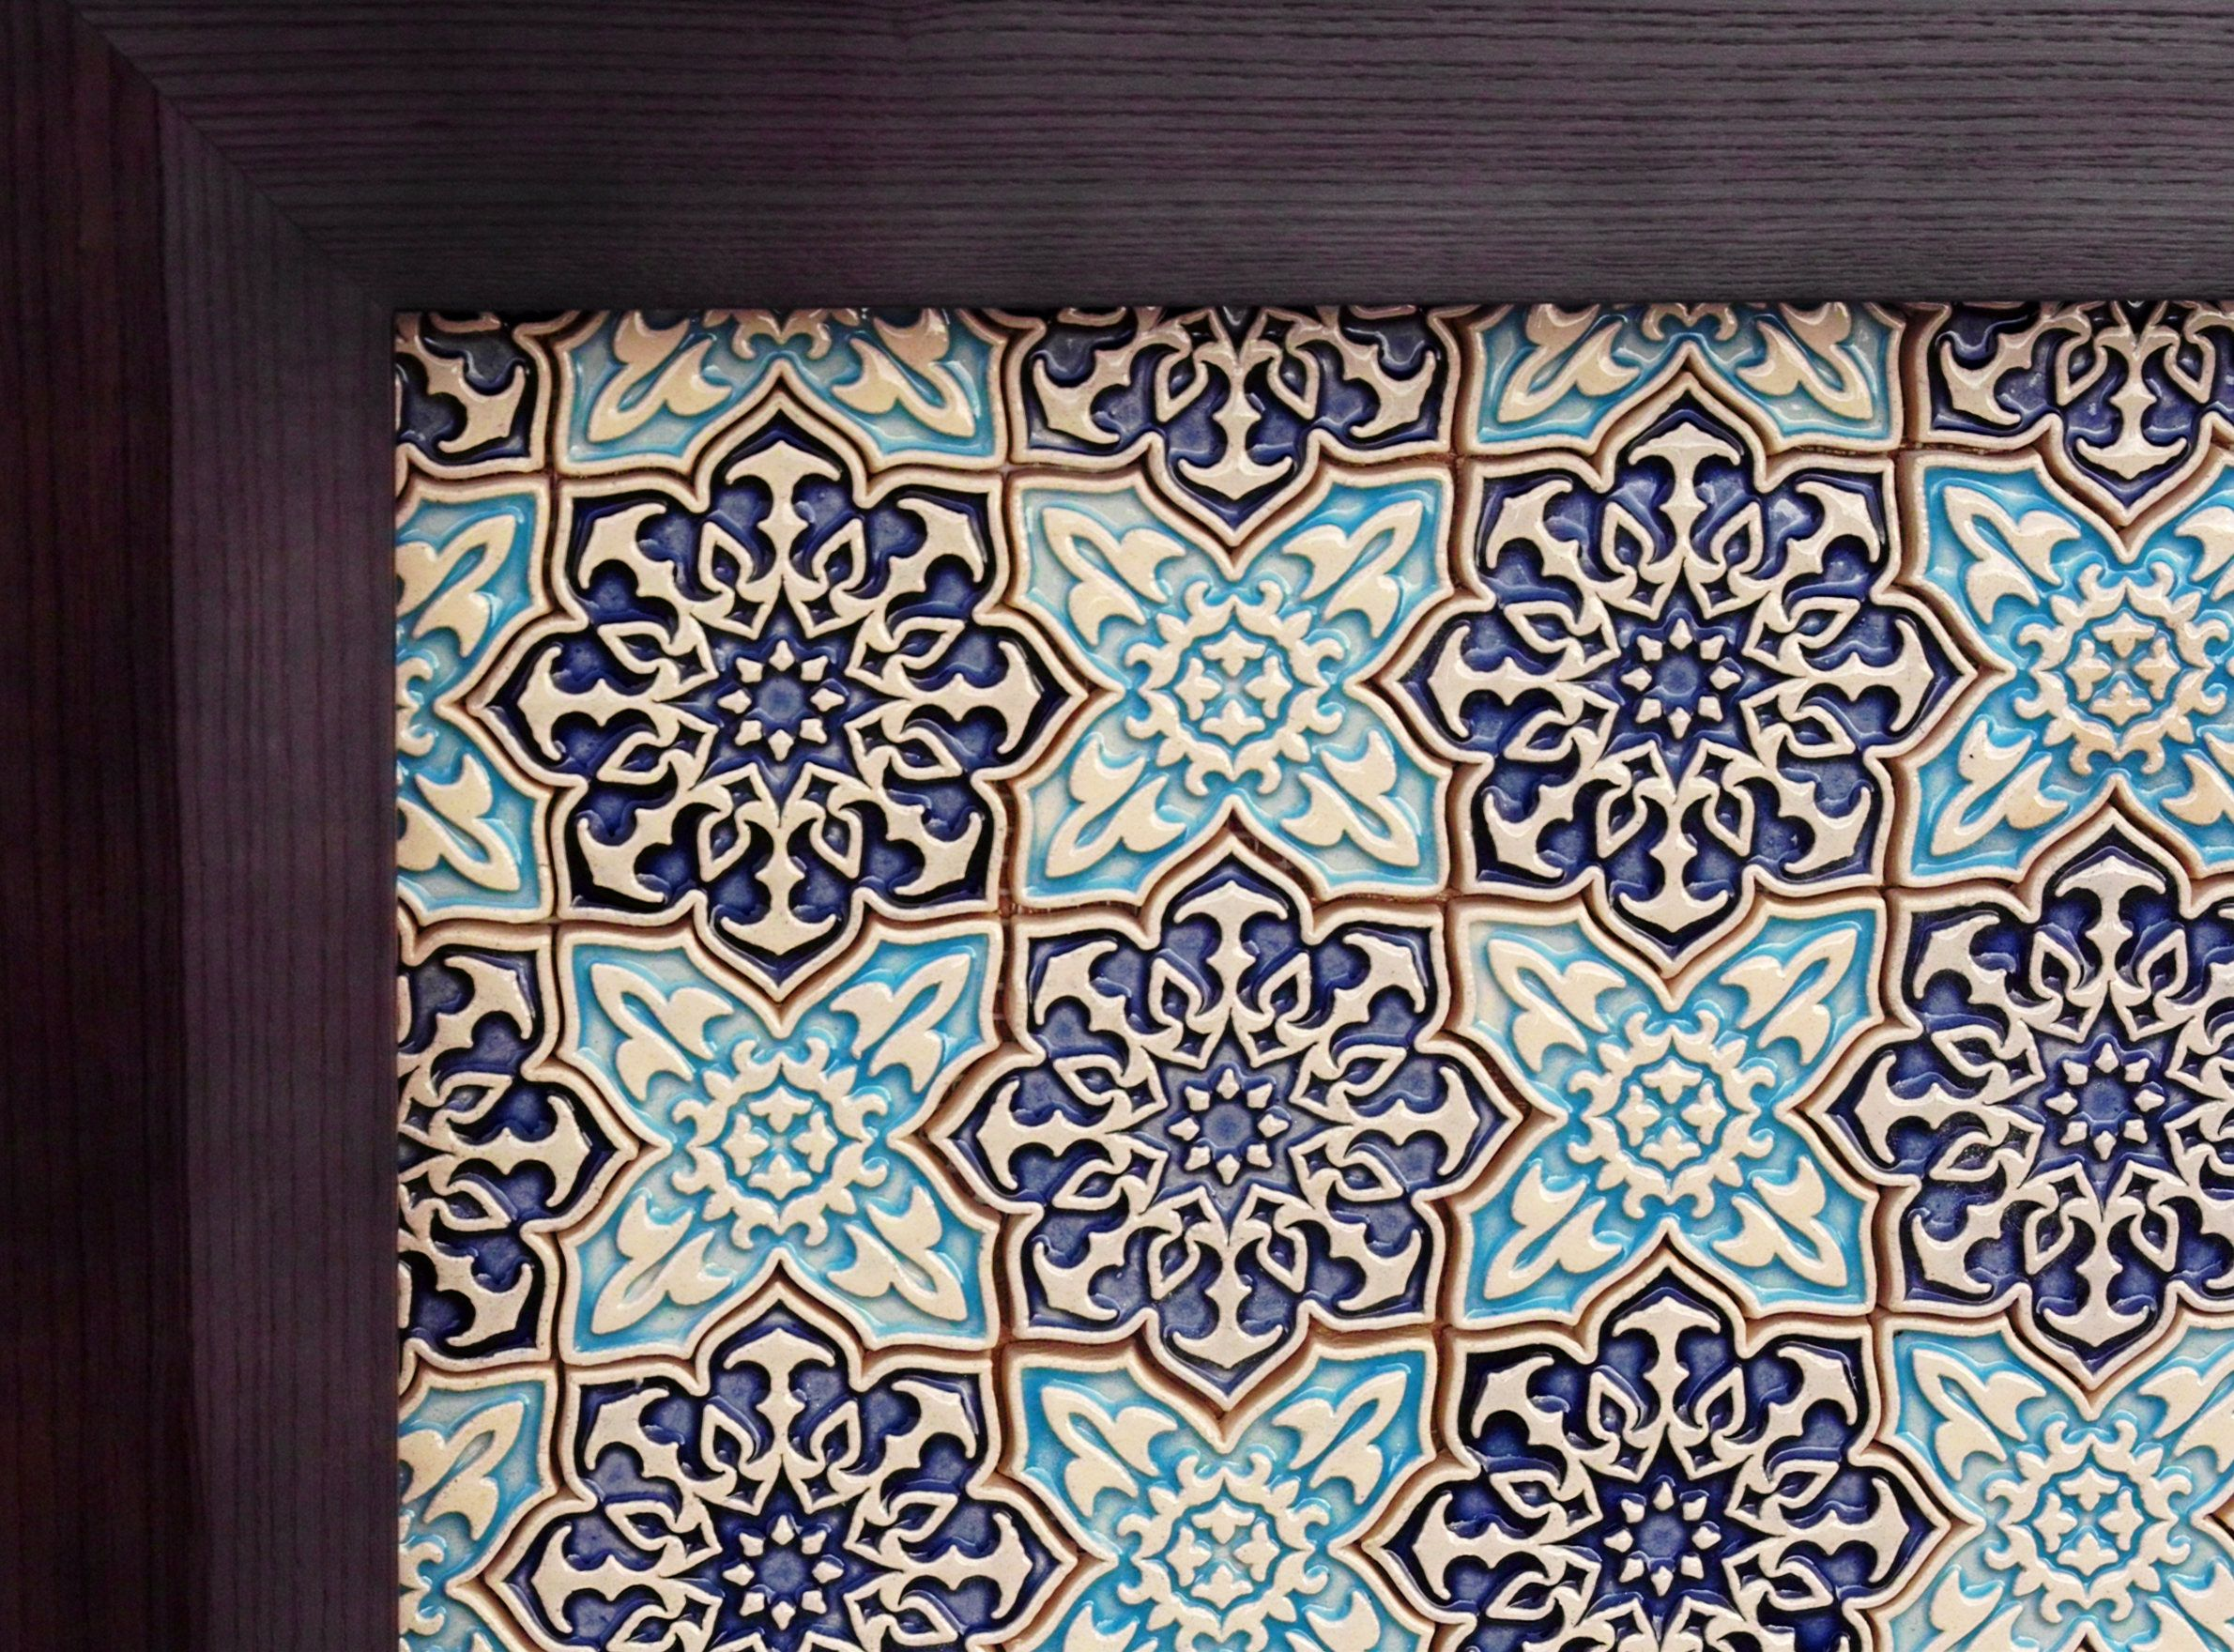 barkhan mosaic tile for interior and exterior decoration handmade ceramic wall tiles home decor mosaic pattern mosaics